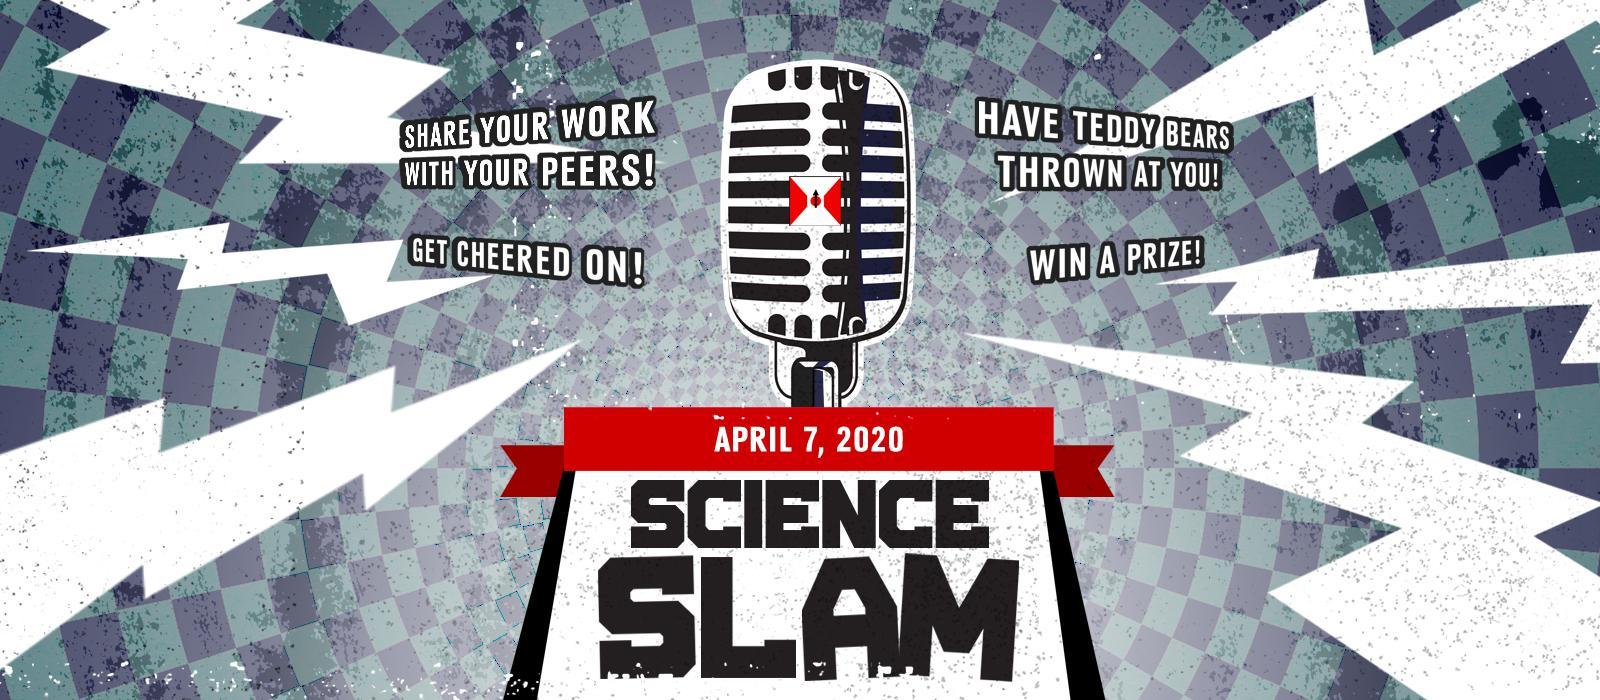 2020 Science Slam web banner